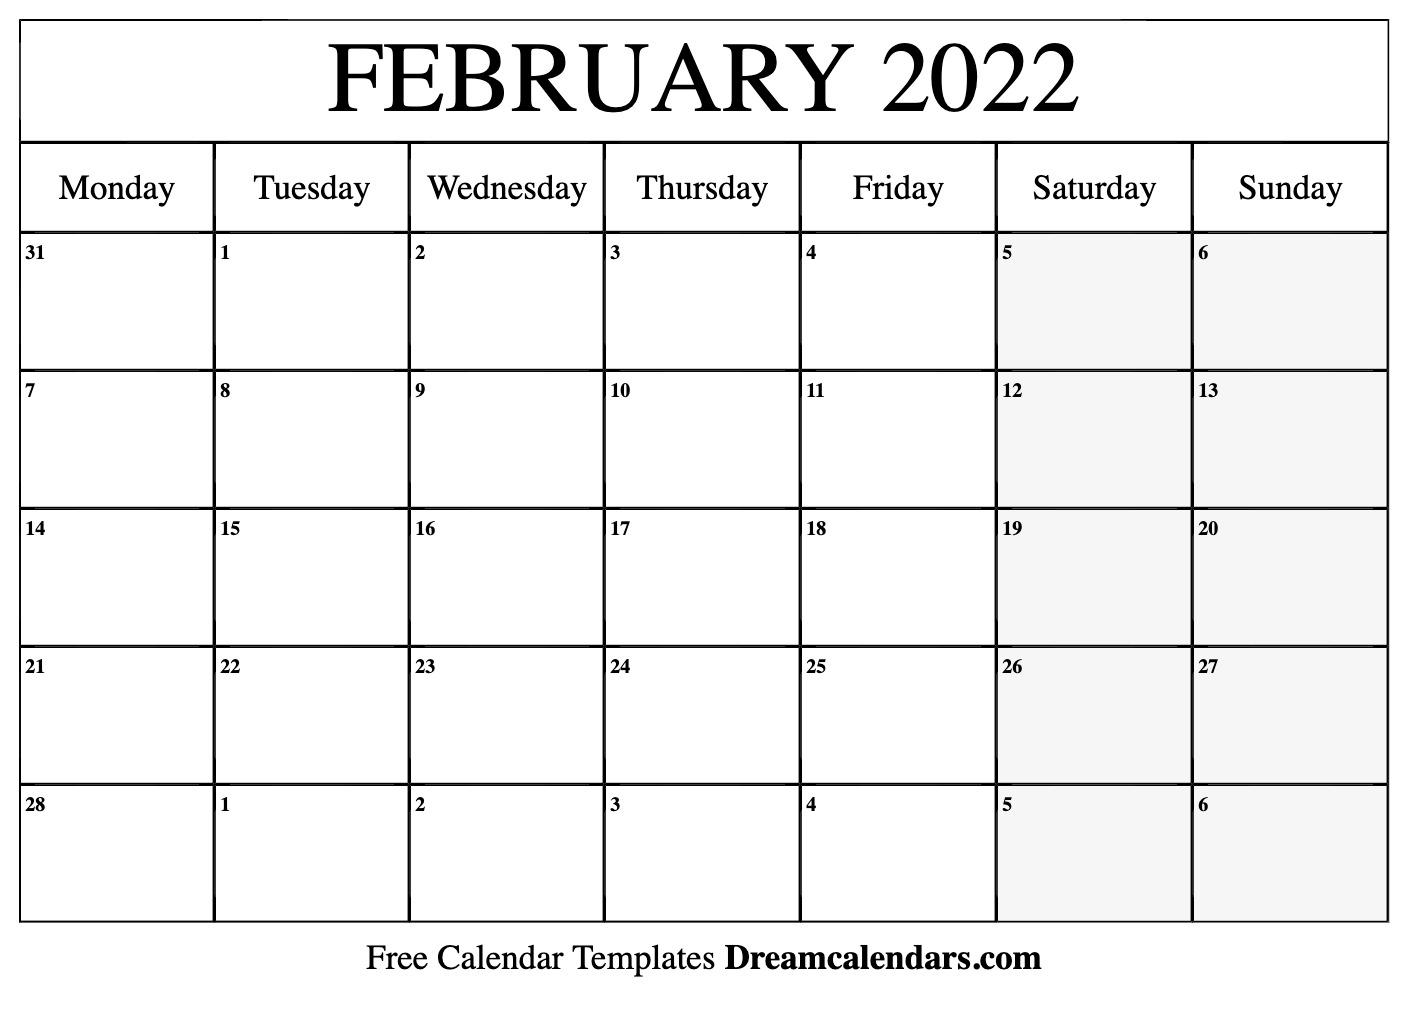 February 2022 Blank Calendar.February 2022 Calendar Free Blank Printable Templates